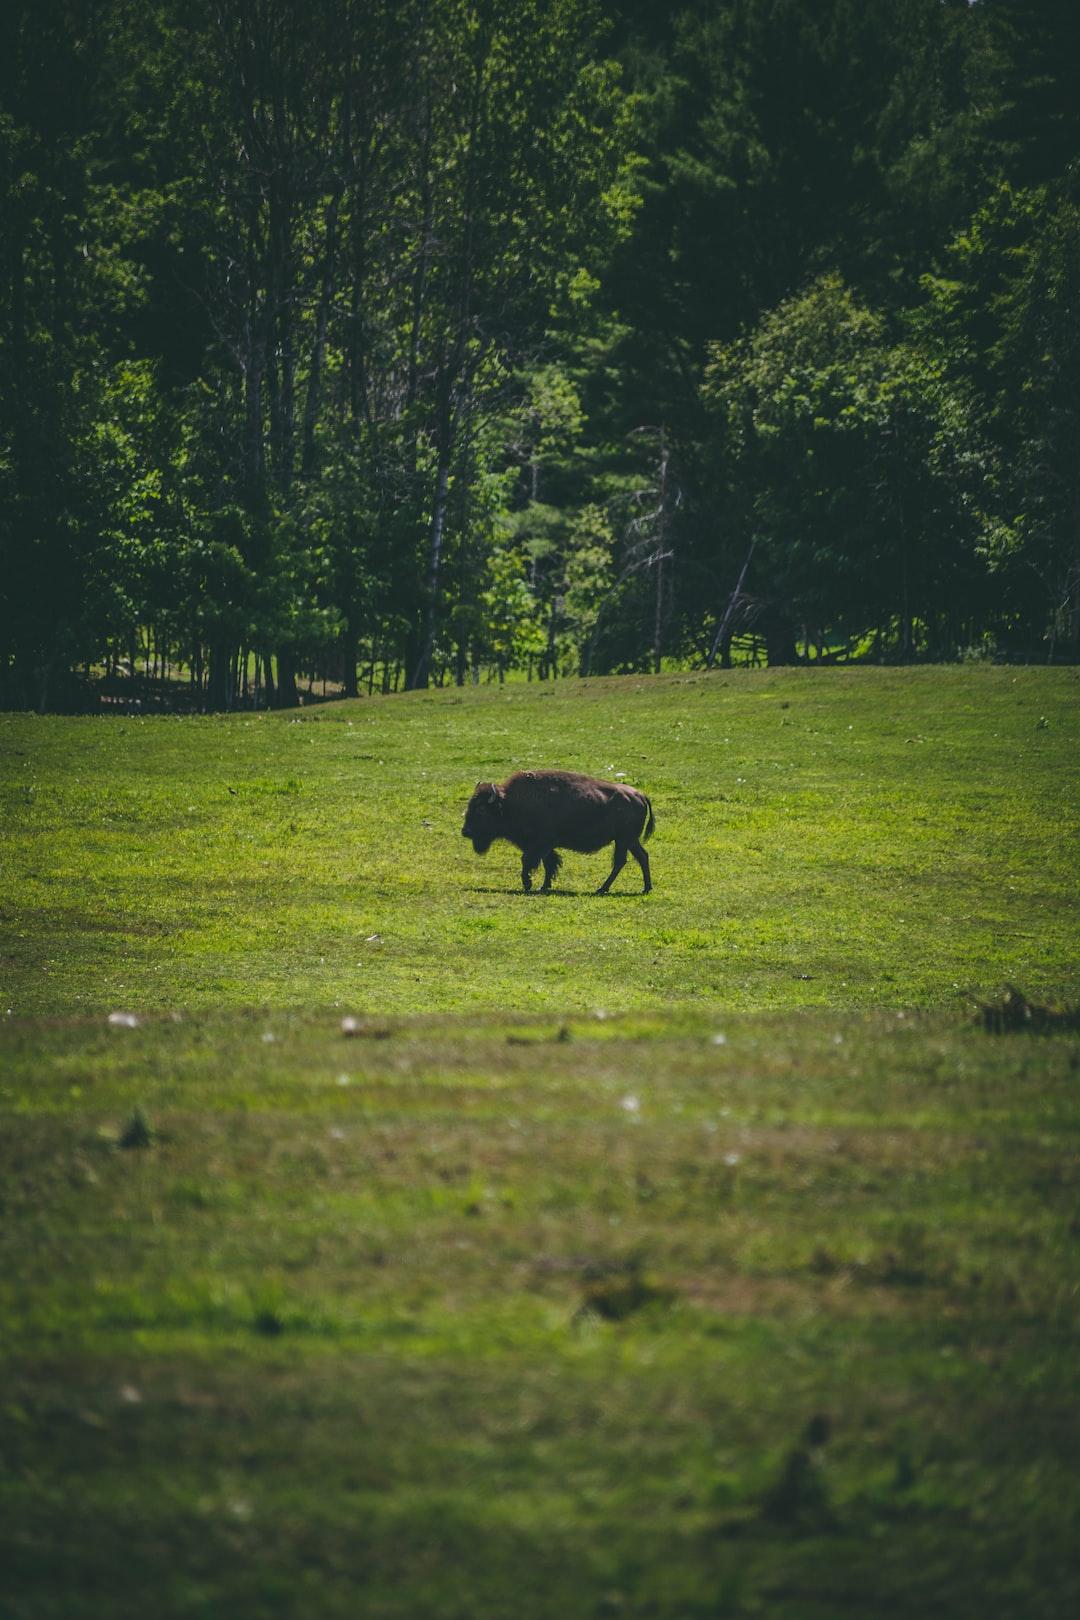 Buffalo Bison roaming through a plain